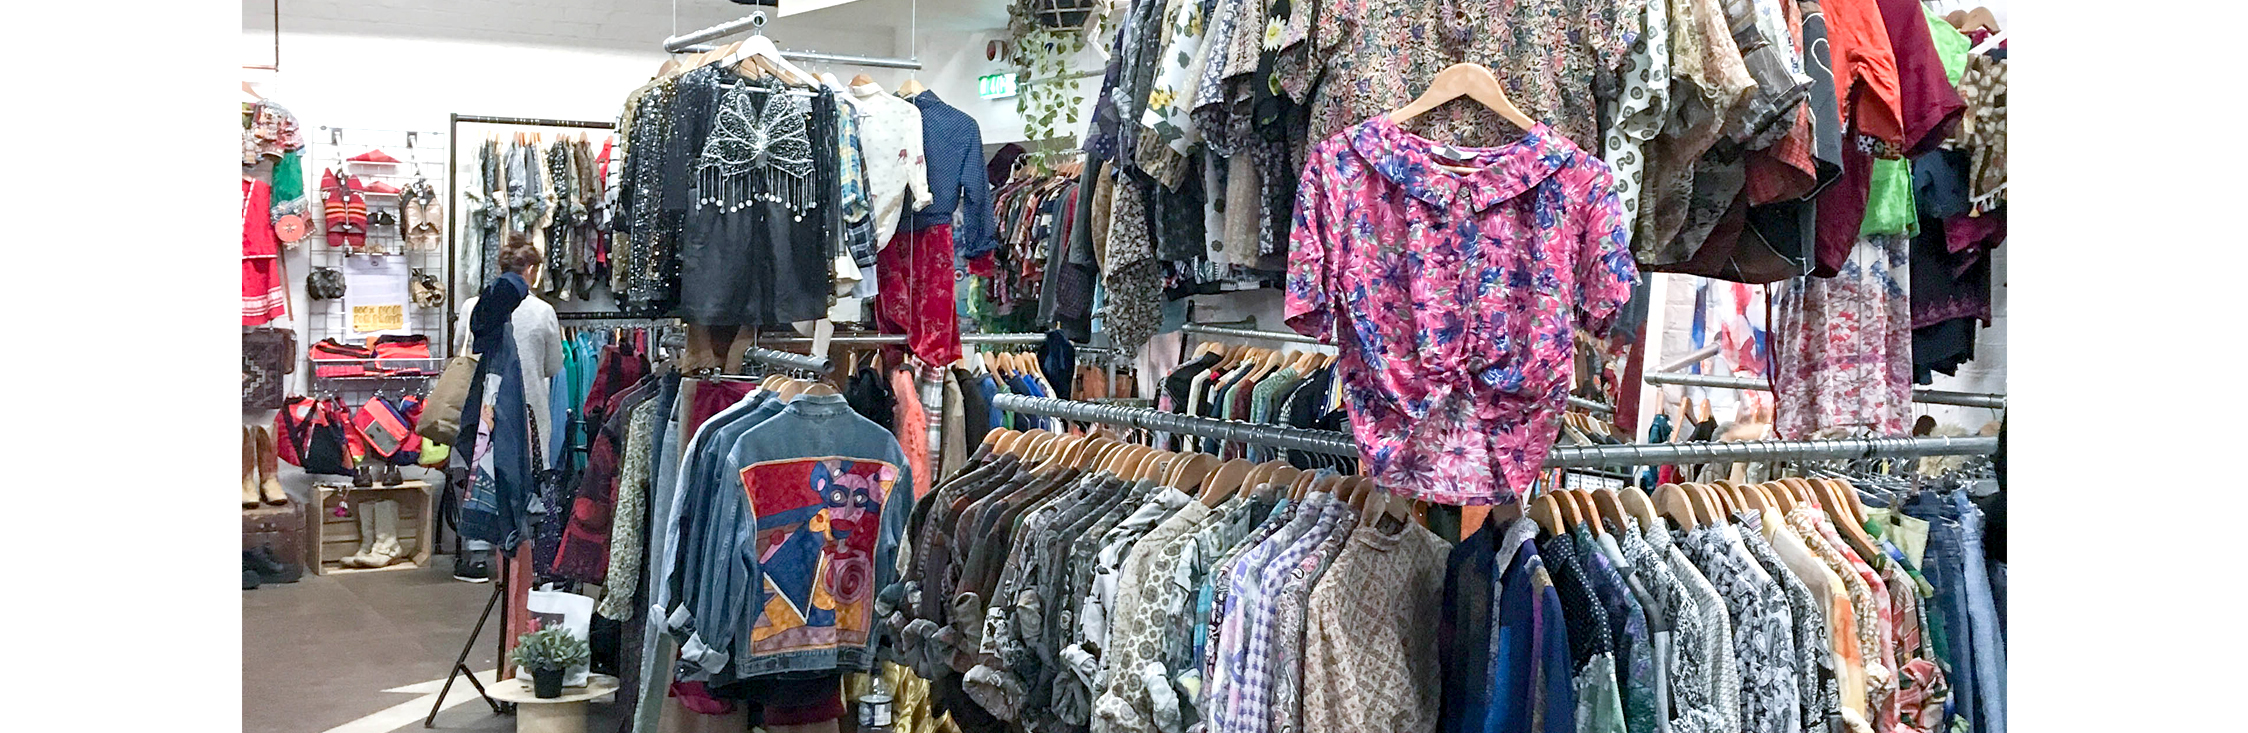 thriftshopping.jpg